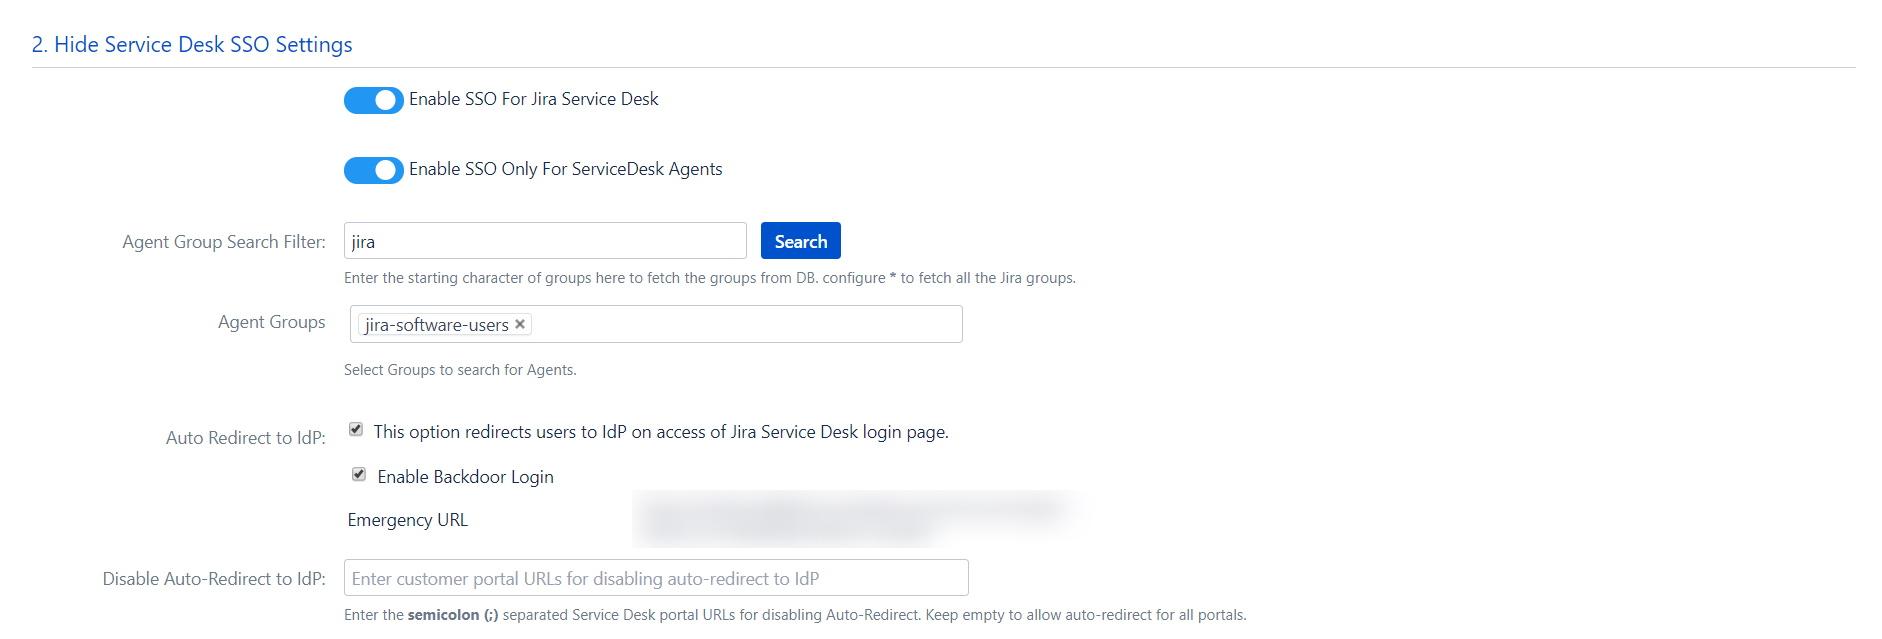 OAuth / OpenID Single Sign On (SSO) into Jira, Service Desk Settings